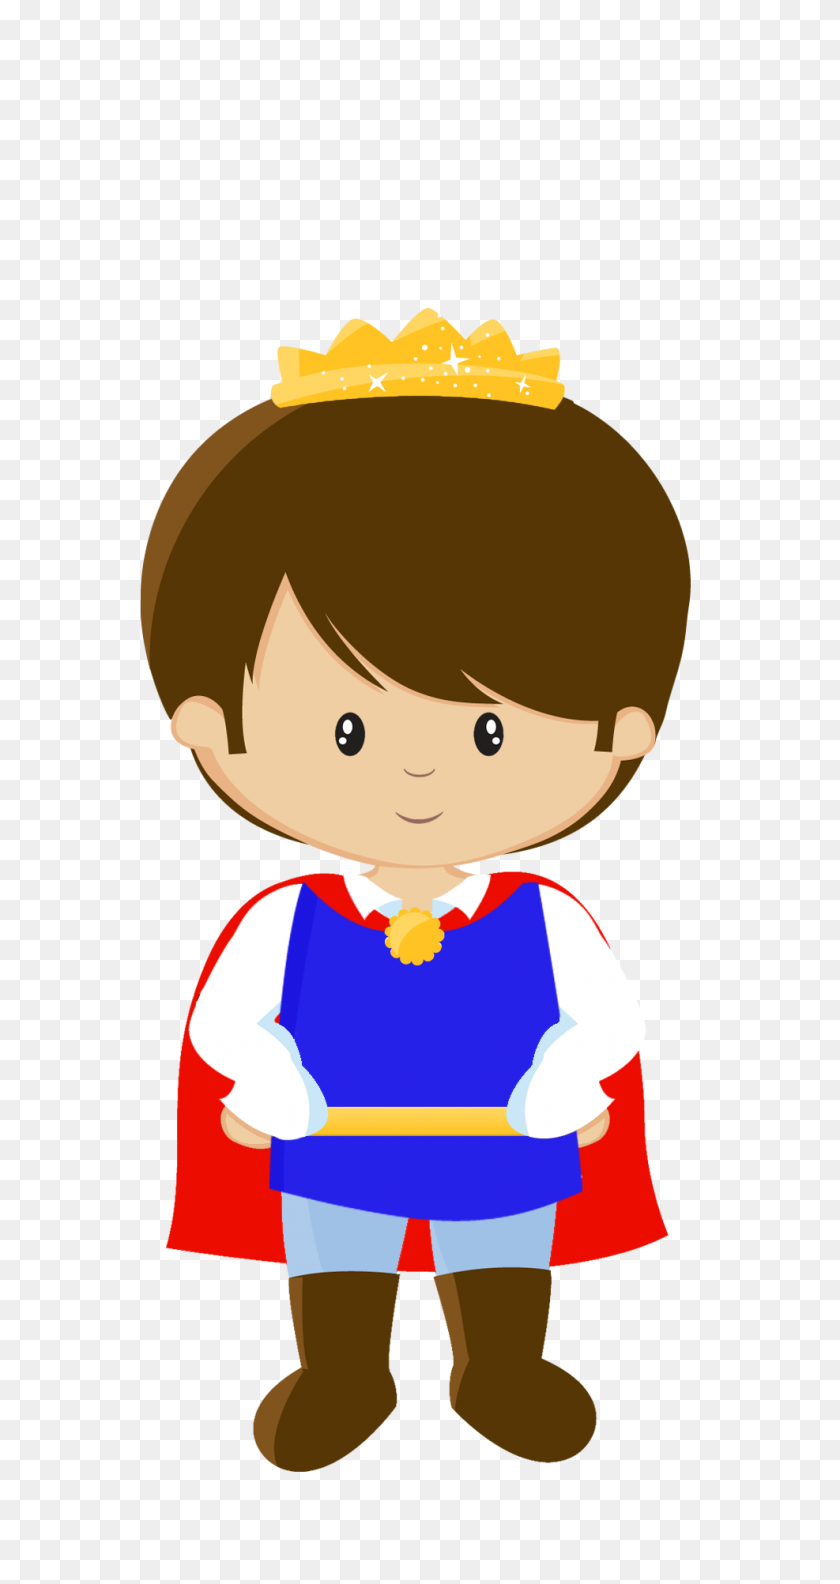 Clip Art - Prince And Princess Clipart